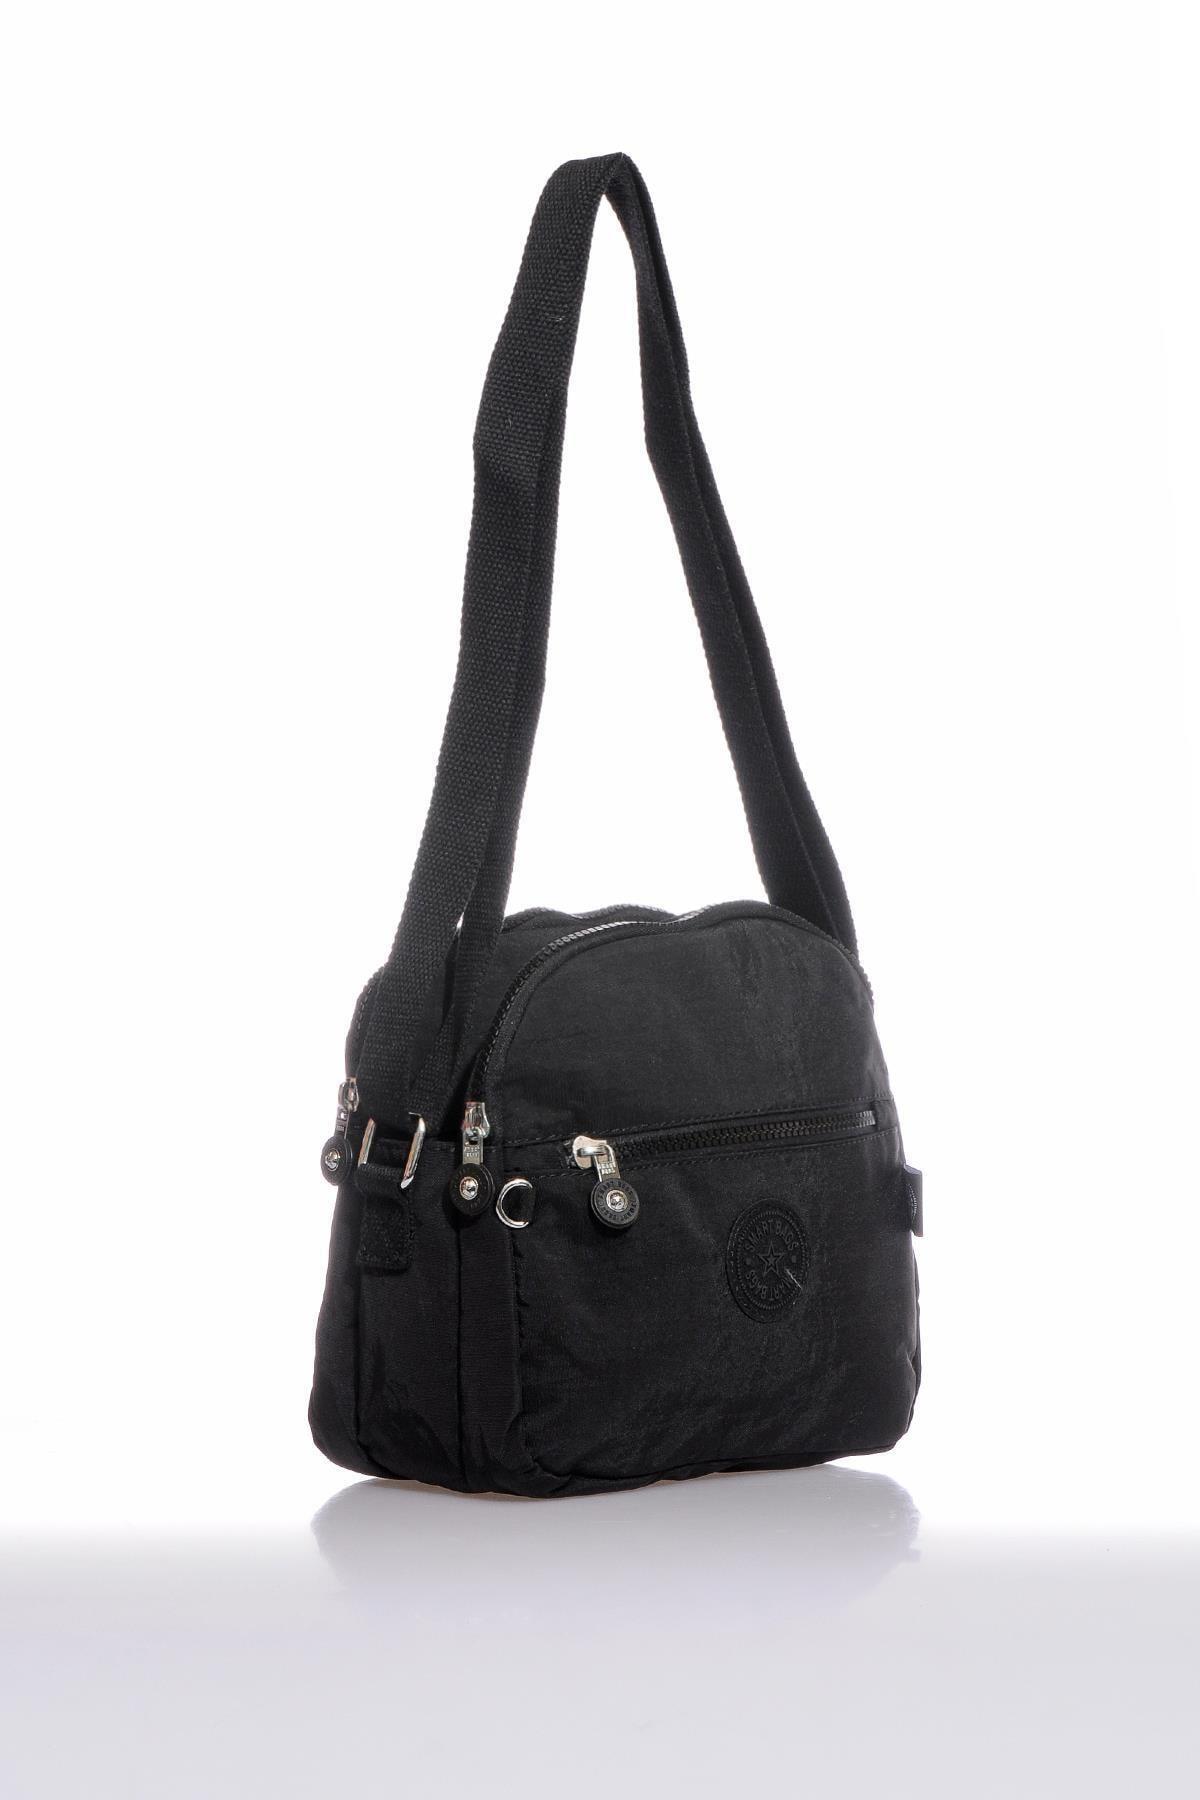 SMART BAGS Smb3058-0001 Siyah Kadın Çapraz Çanta 2